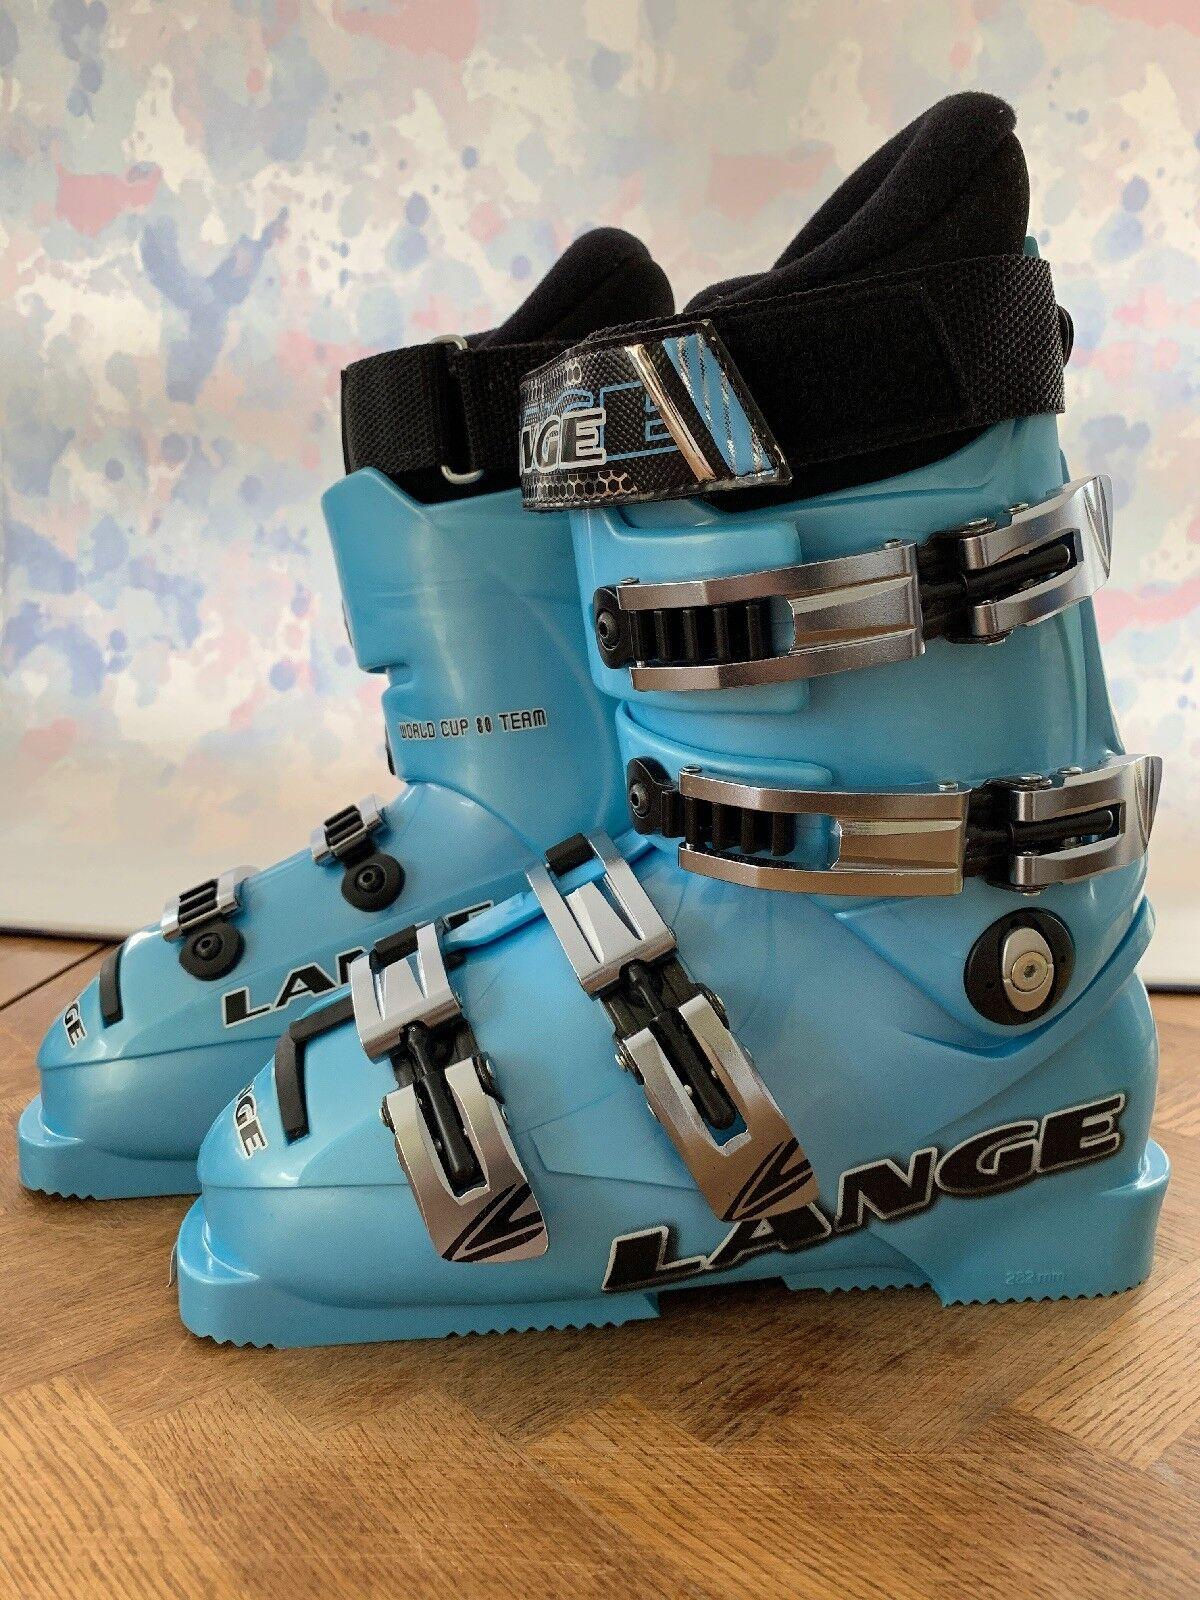 Lange Ski Boots World Cup 80 5.5 38.5 Junior bluee